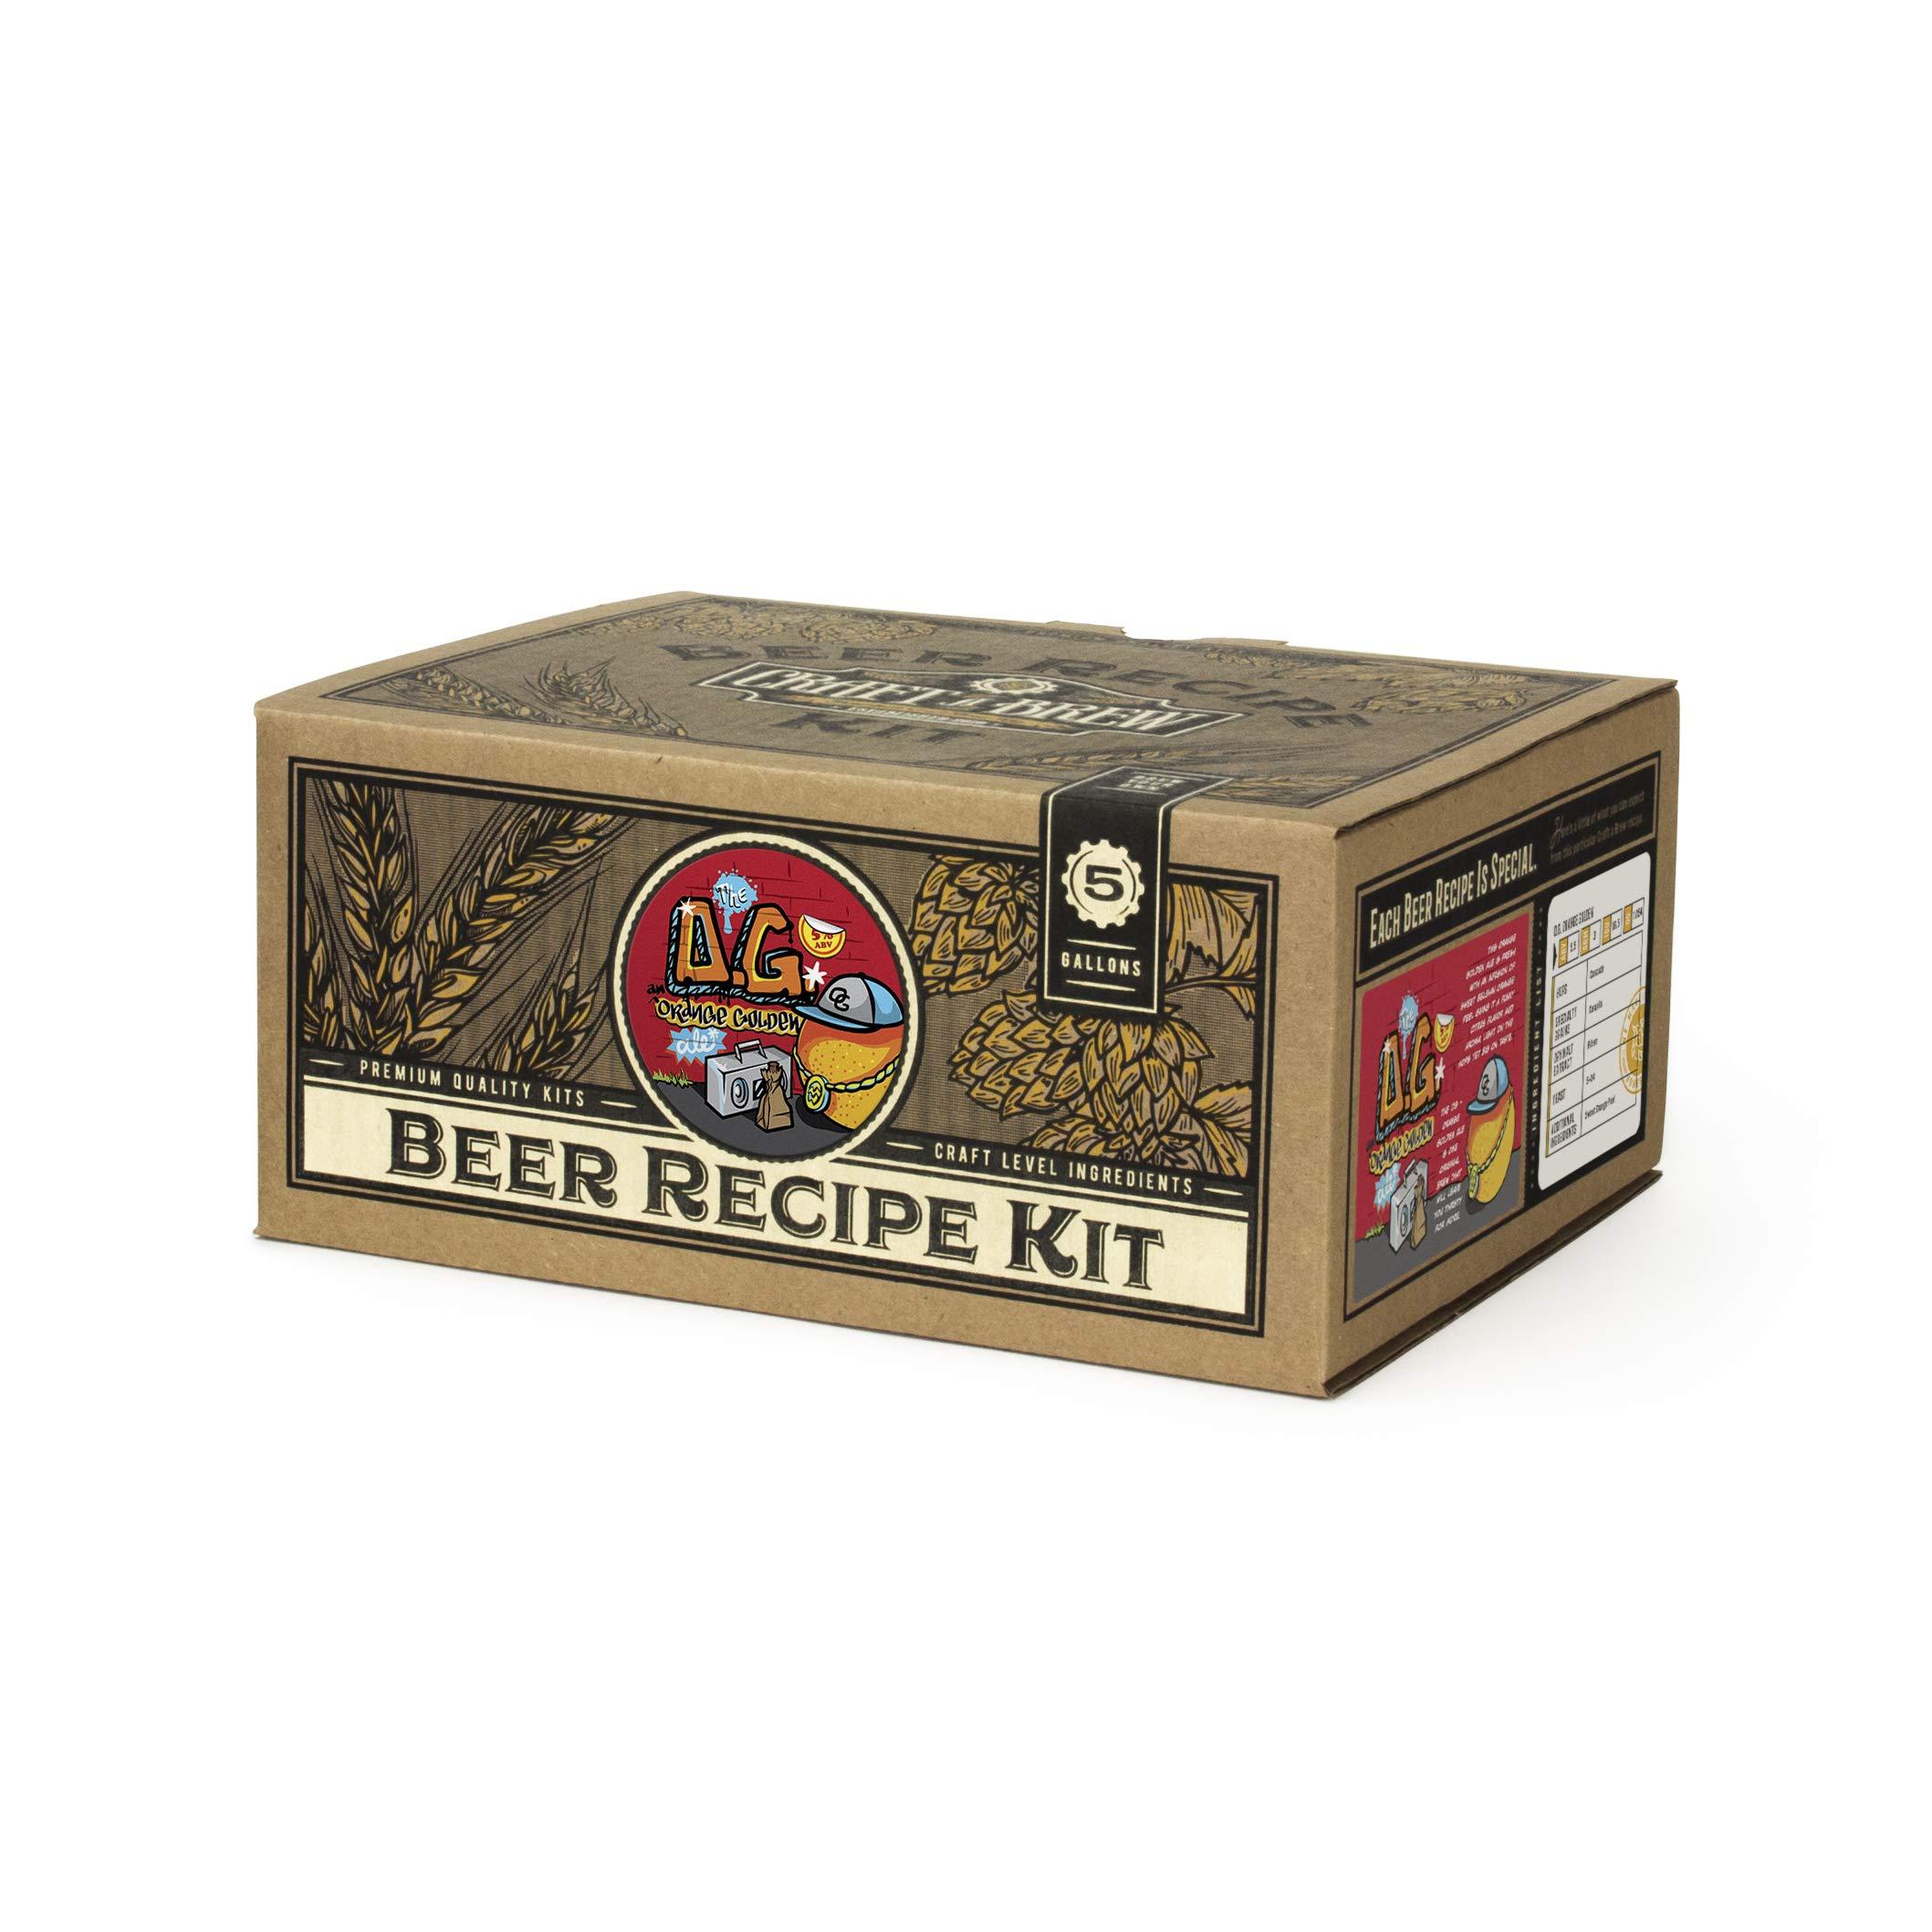 Craft A Brew - Home Brewing Ingredient Kit (5 Gallons) (O.G. Orange Golden Beer)